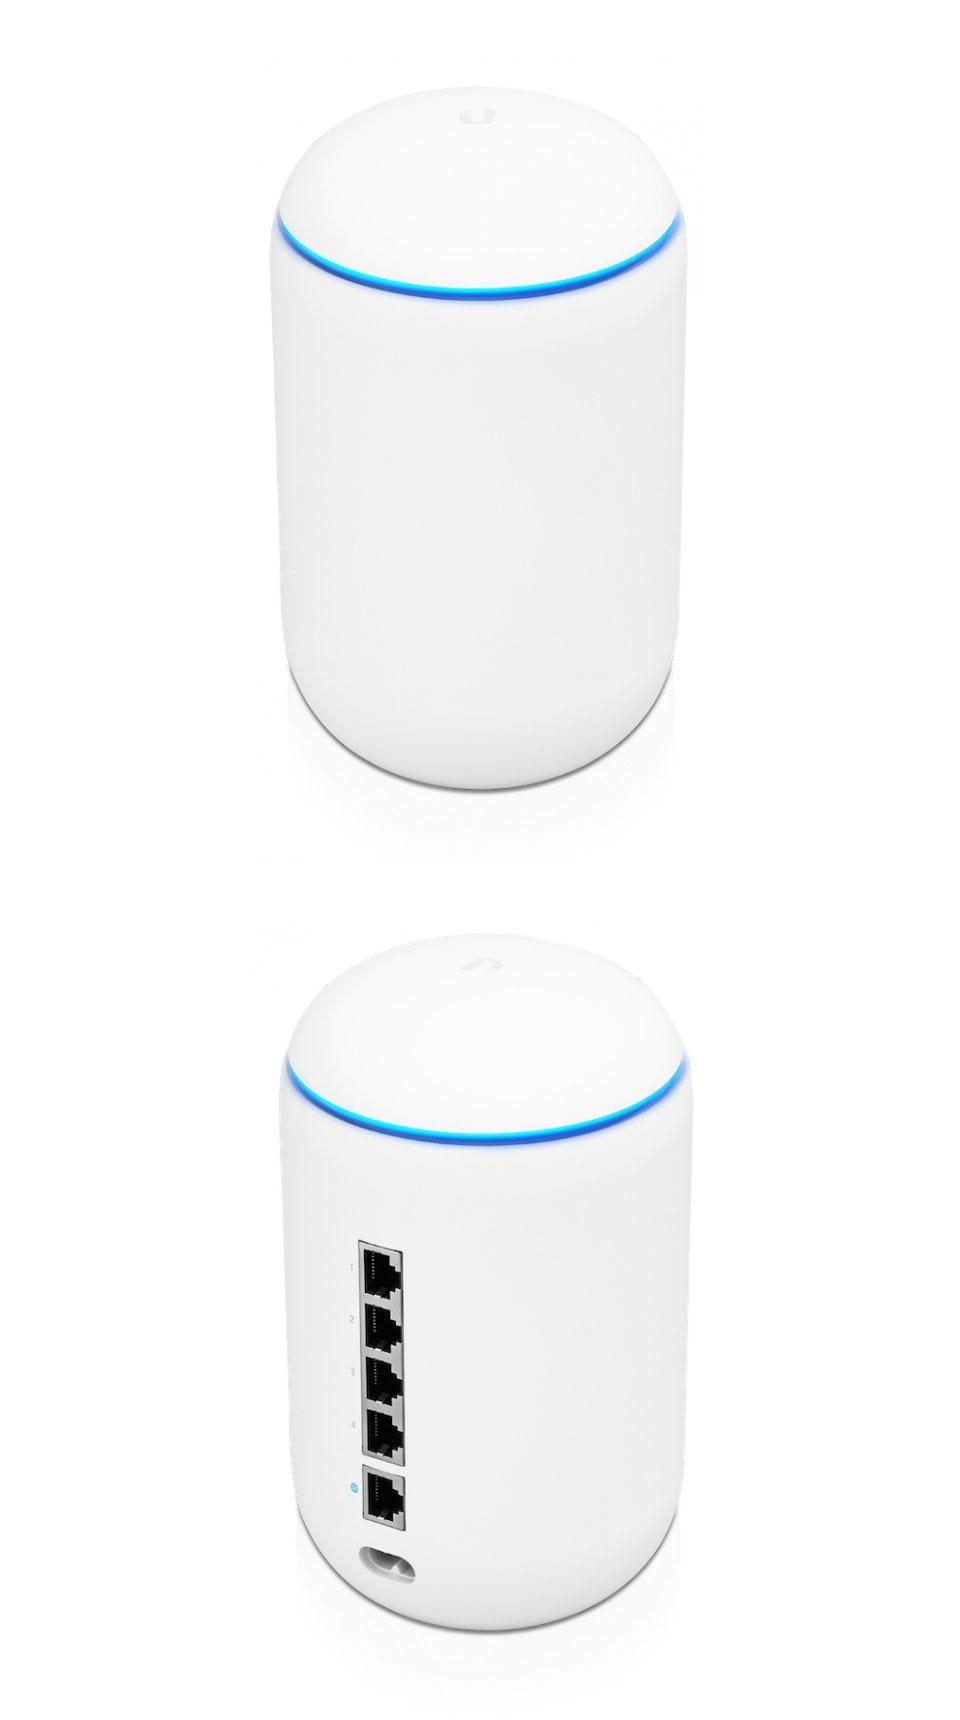 Ubiquiti UniFi Dream Machine Wireless Router product